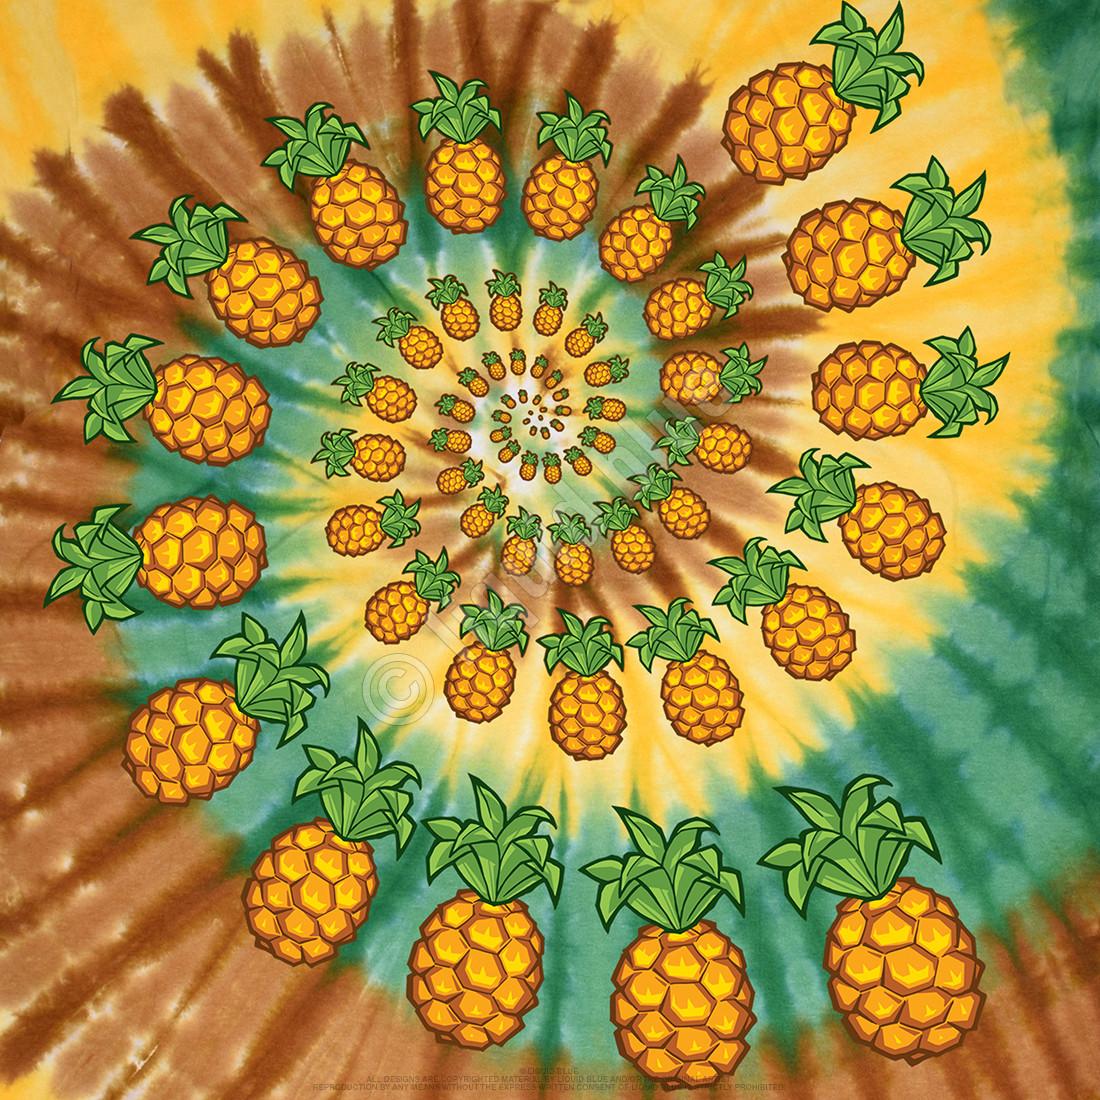 Pineapple Spiral Tie-Dye T-Shirt